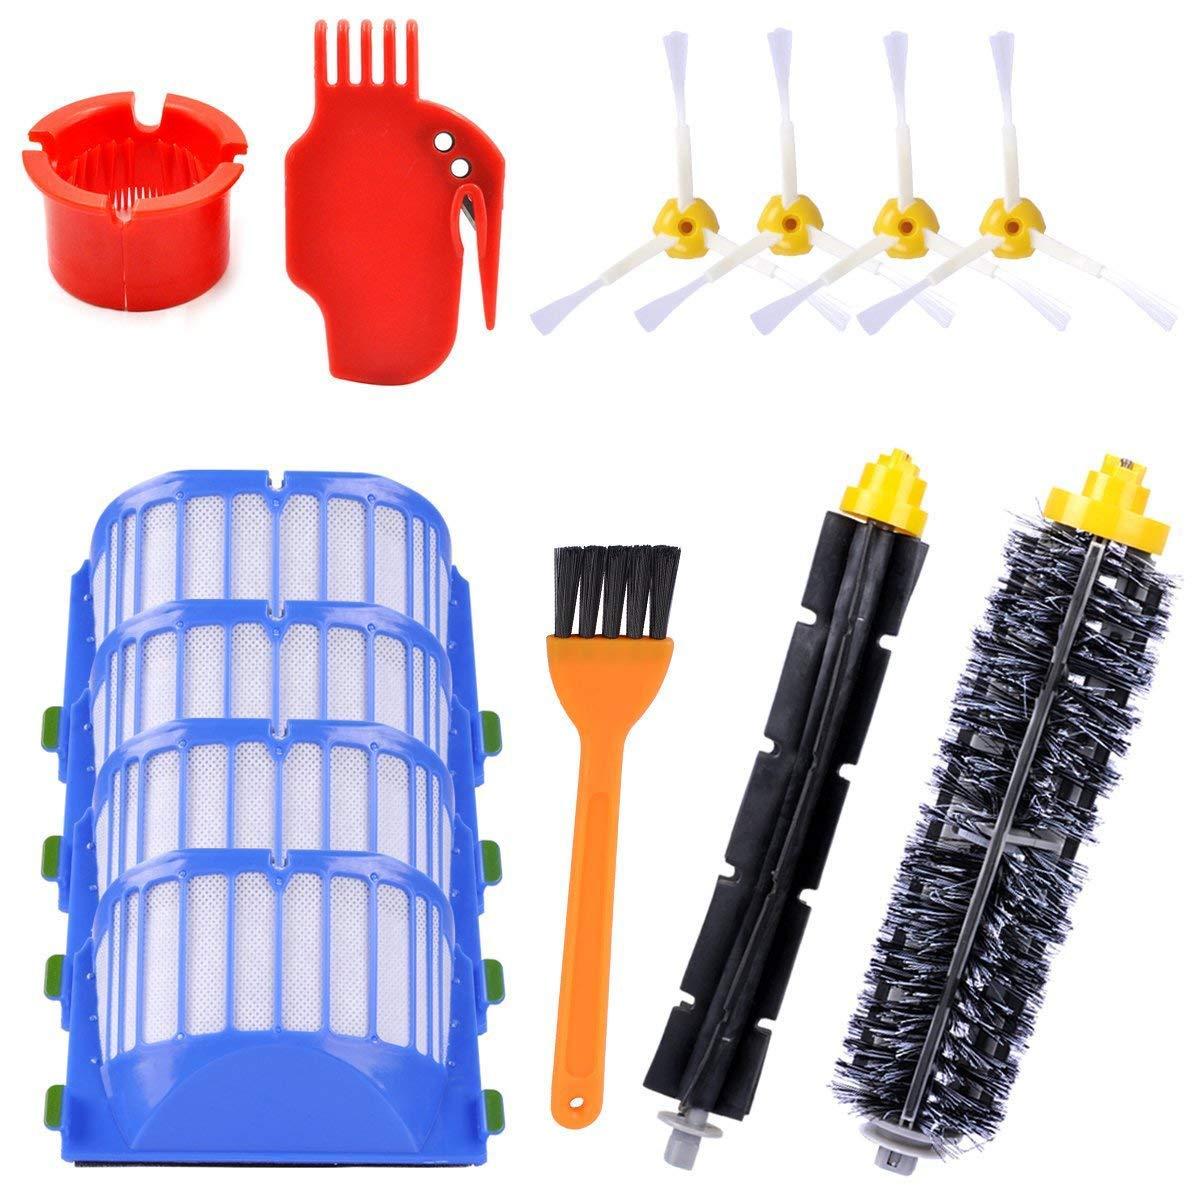 Top Sale Replacement Parts For IRobot Roomba 600 Series 595 614 620 650 652 671 675 680 690 Robotic Vacuum Cleaner